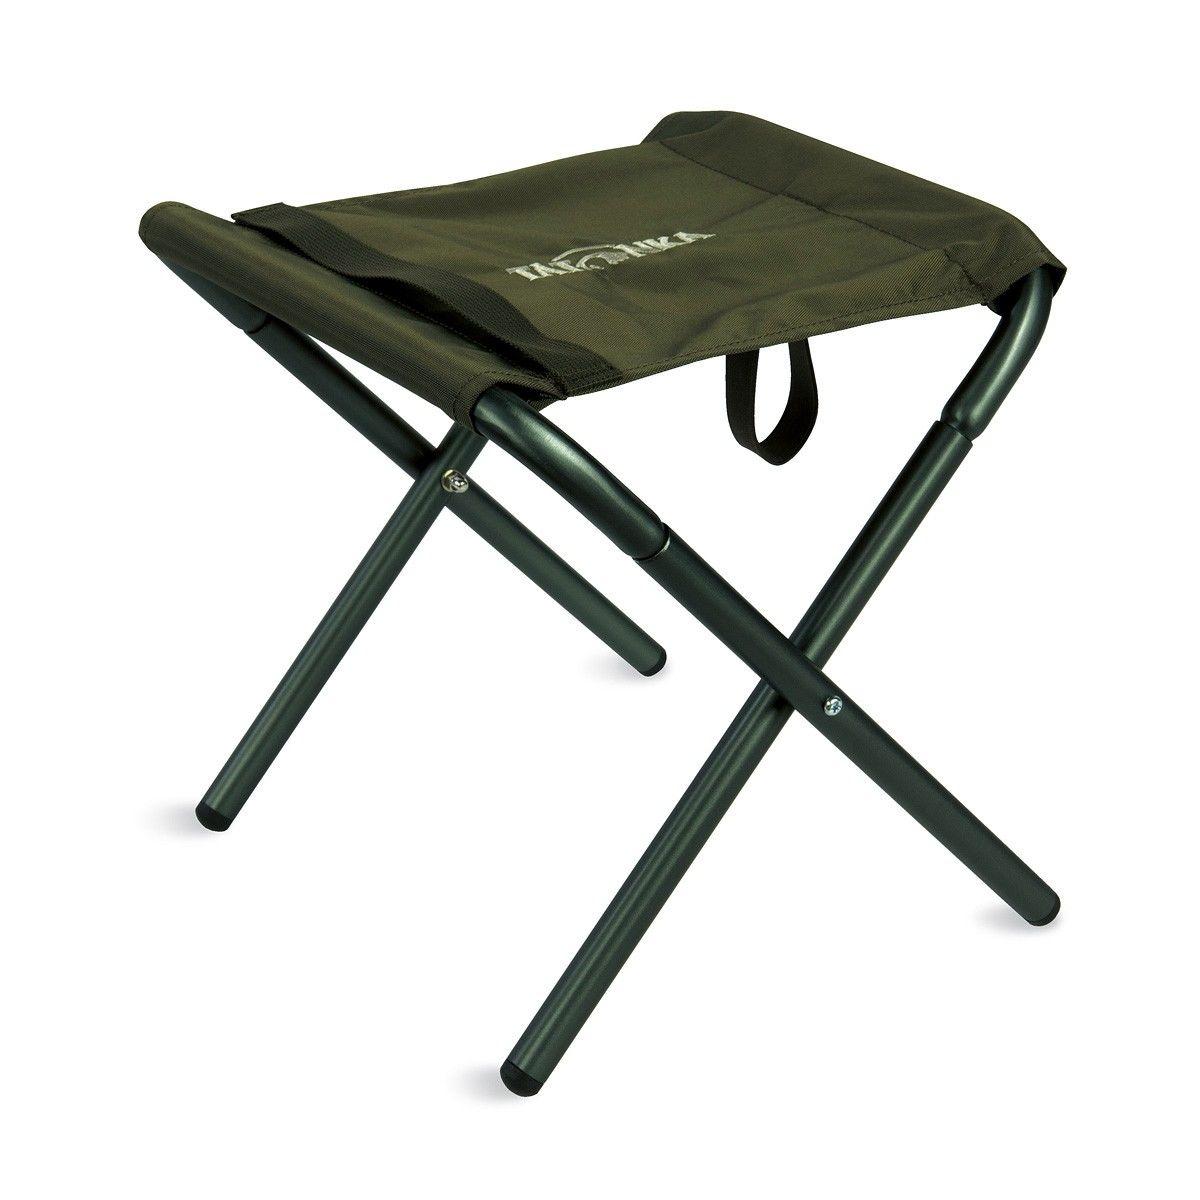 Tatonka Foldable Chair Grün, One Size -Farbe Olive, One Size